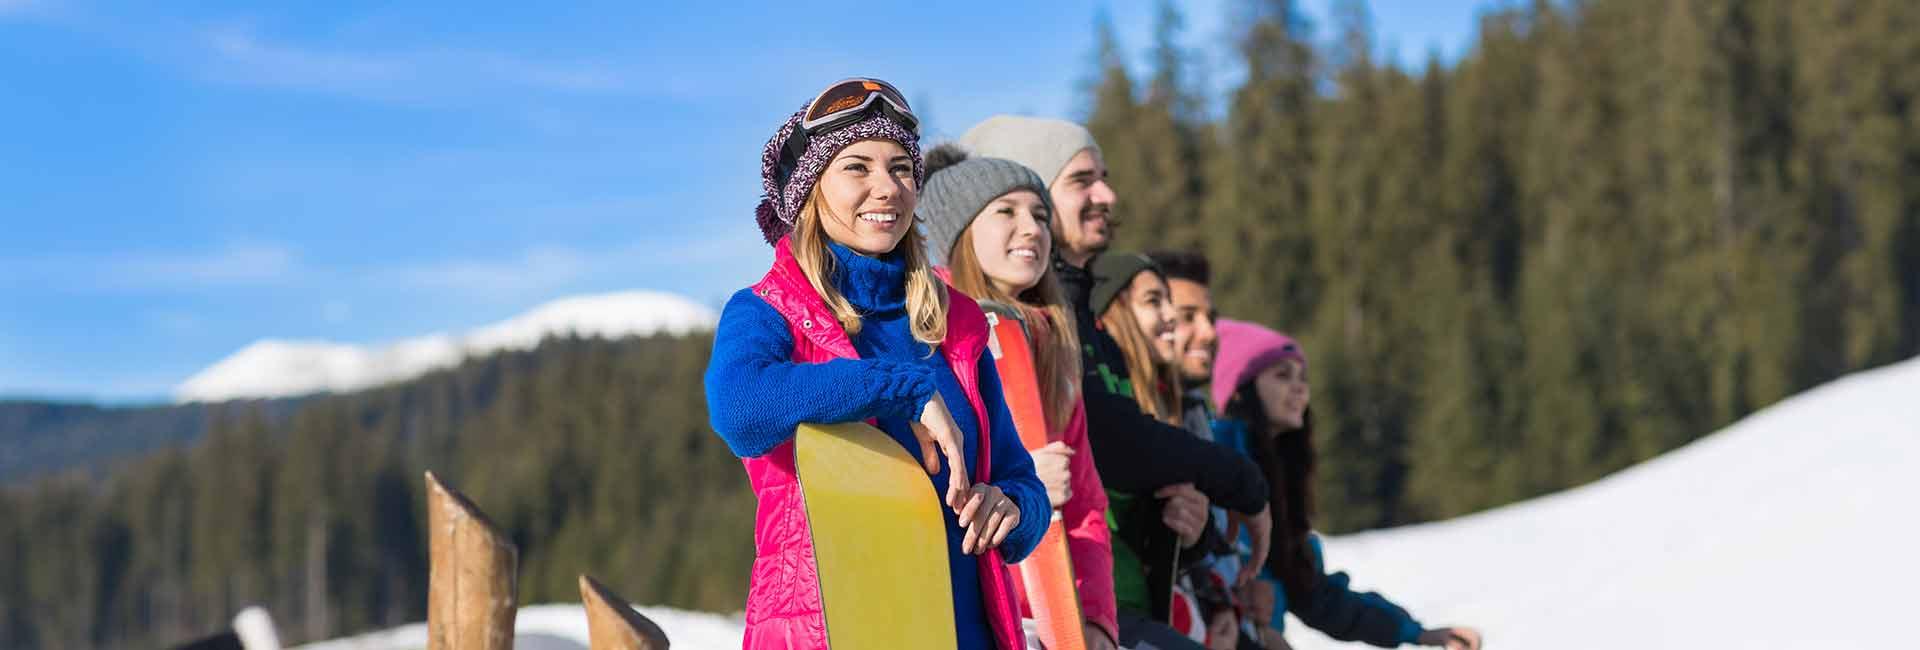 vacanta ski agentie turism brasov